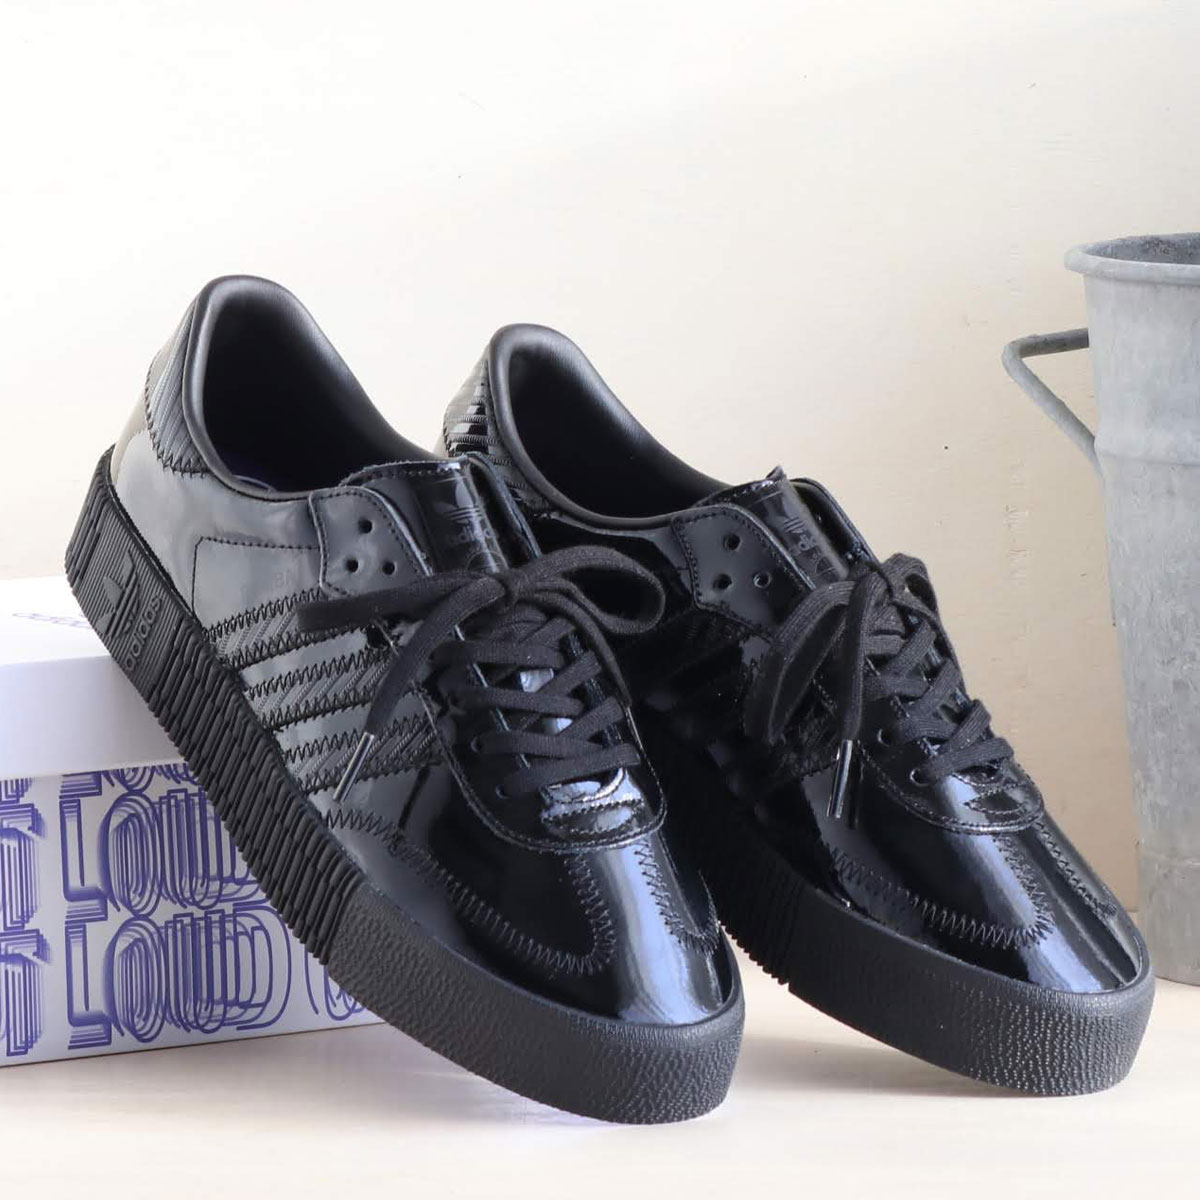 adidas Originals SAMBAROSE W(アディダスオリジナルス サンバローズ W)CORE BLACK/CORE BLACK/ACTIVE PURPLE【メンズ レディース スニーカー】19SS-I